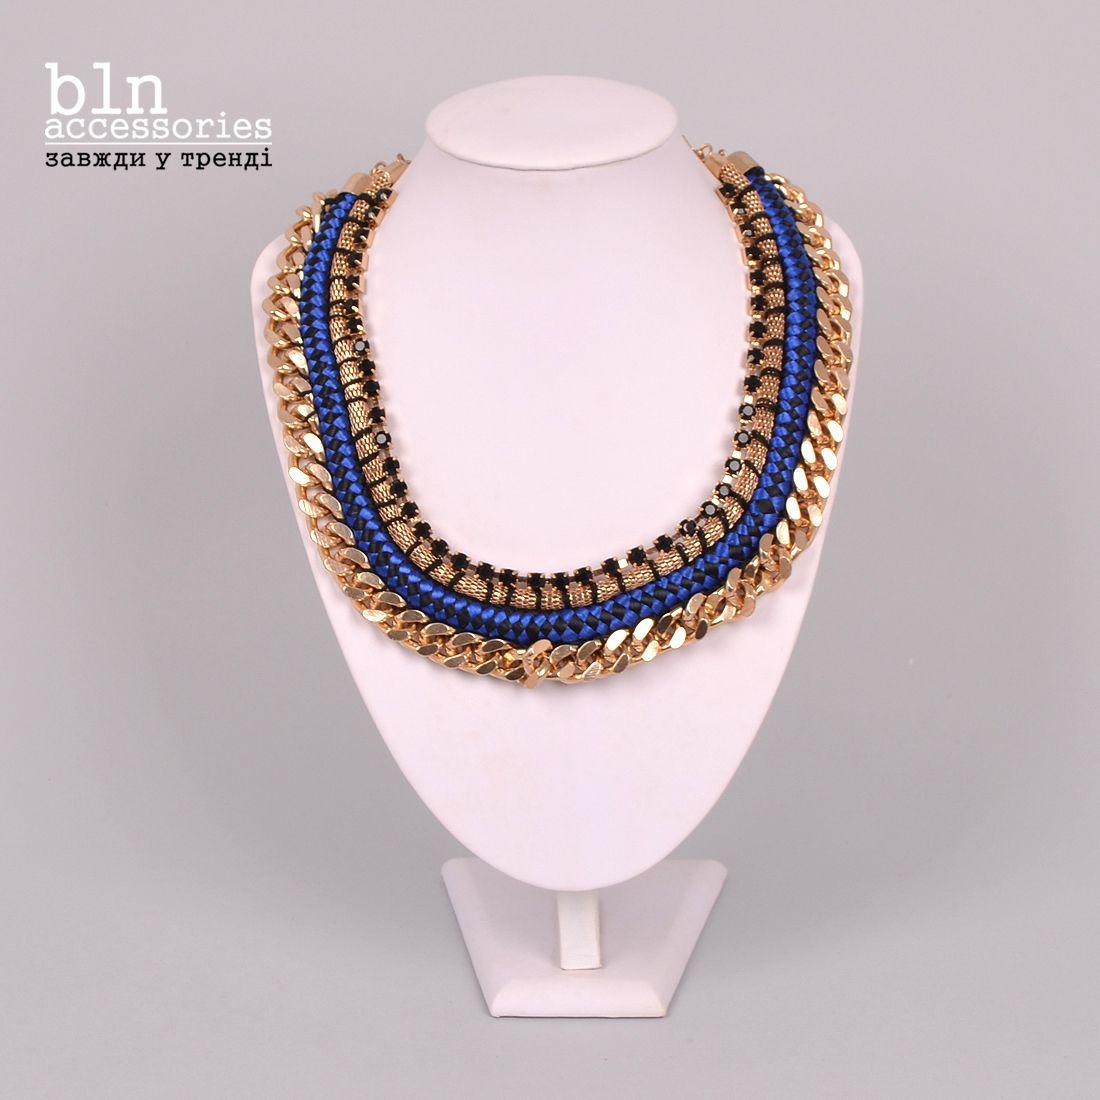 Стильне кольє в магазинах BLN accessories \ Stylish necklace in stores BLN accessories.